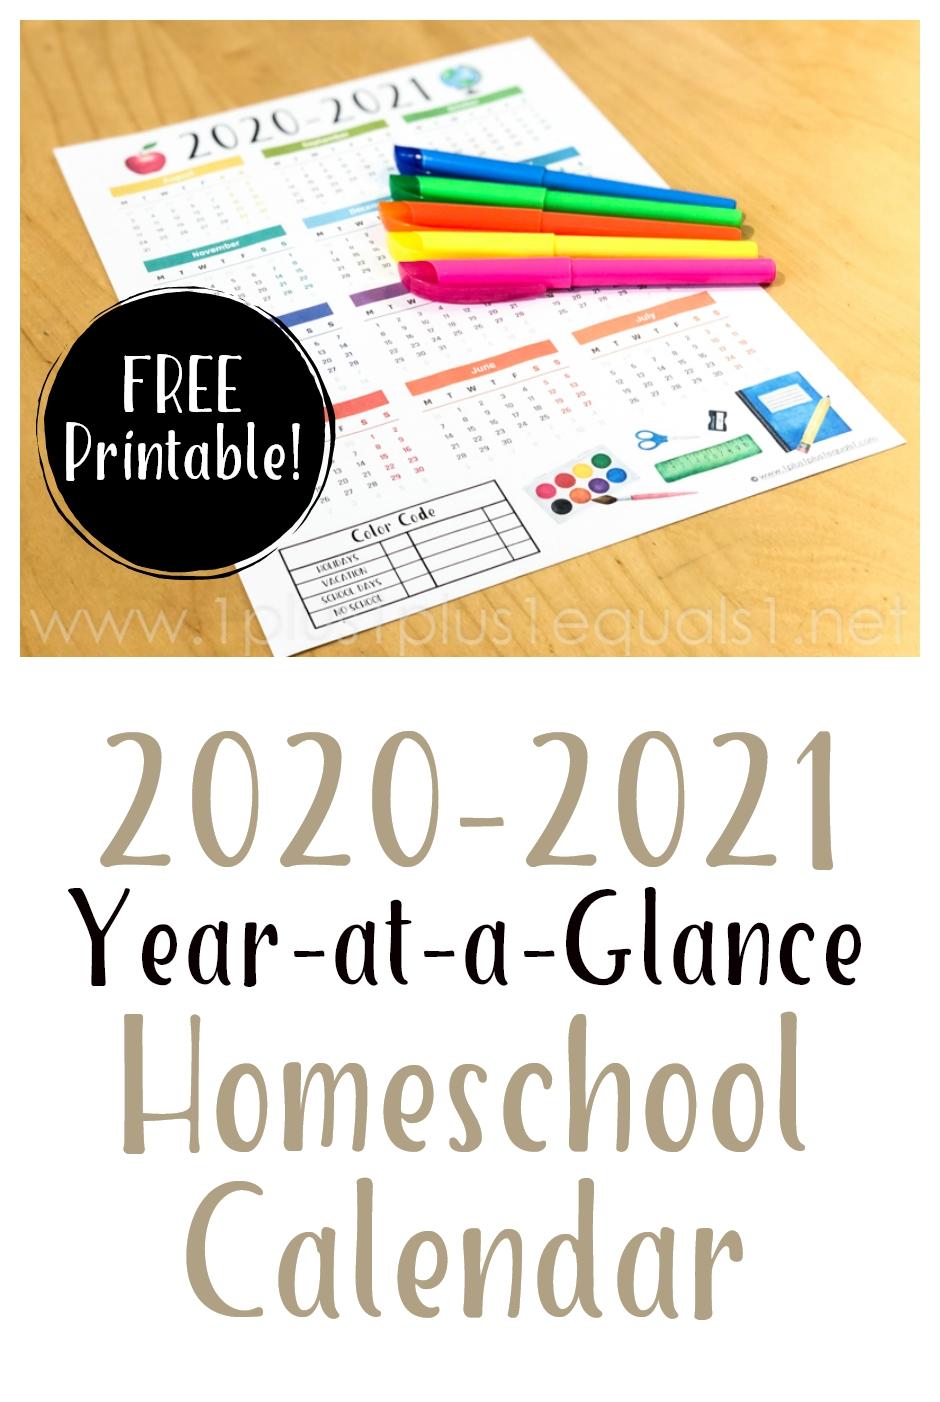 2020-2021 Year At A Glance Homeschool Calendar Printable - 1